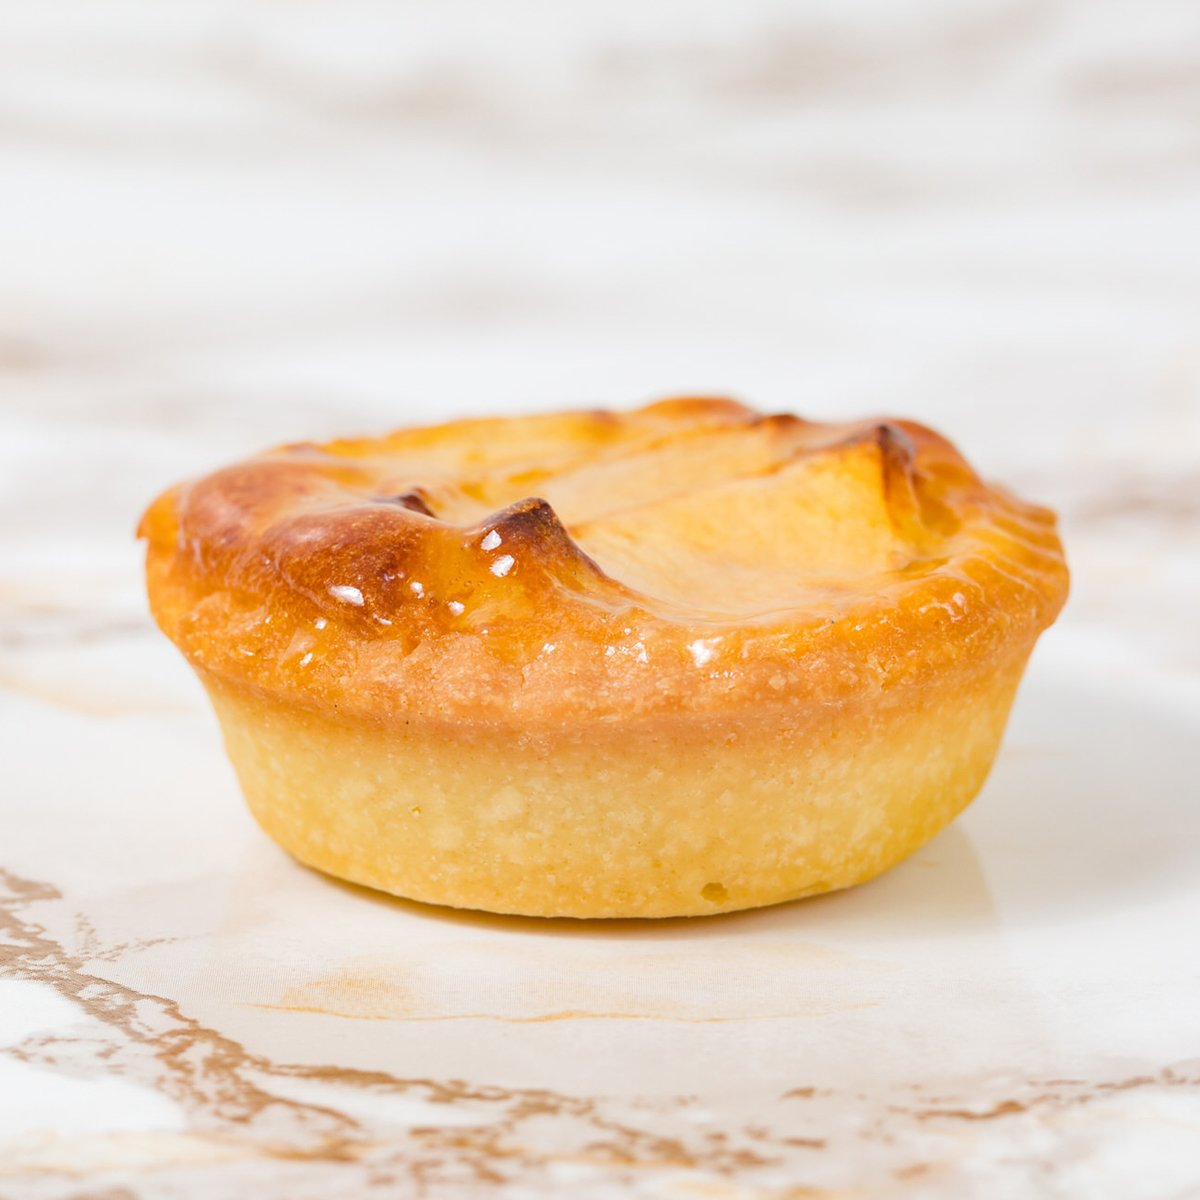 Pear and Almond Tart Single | Merci Beaucoup Cakes